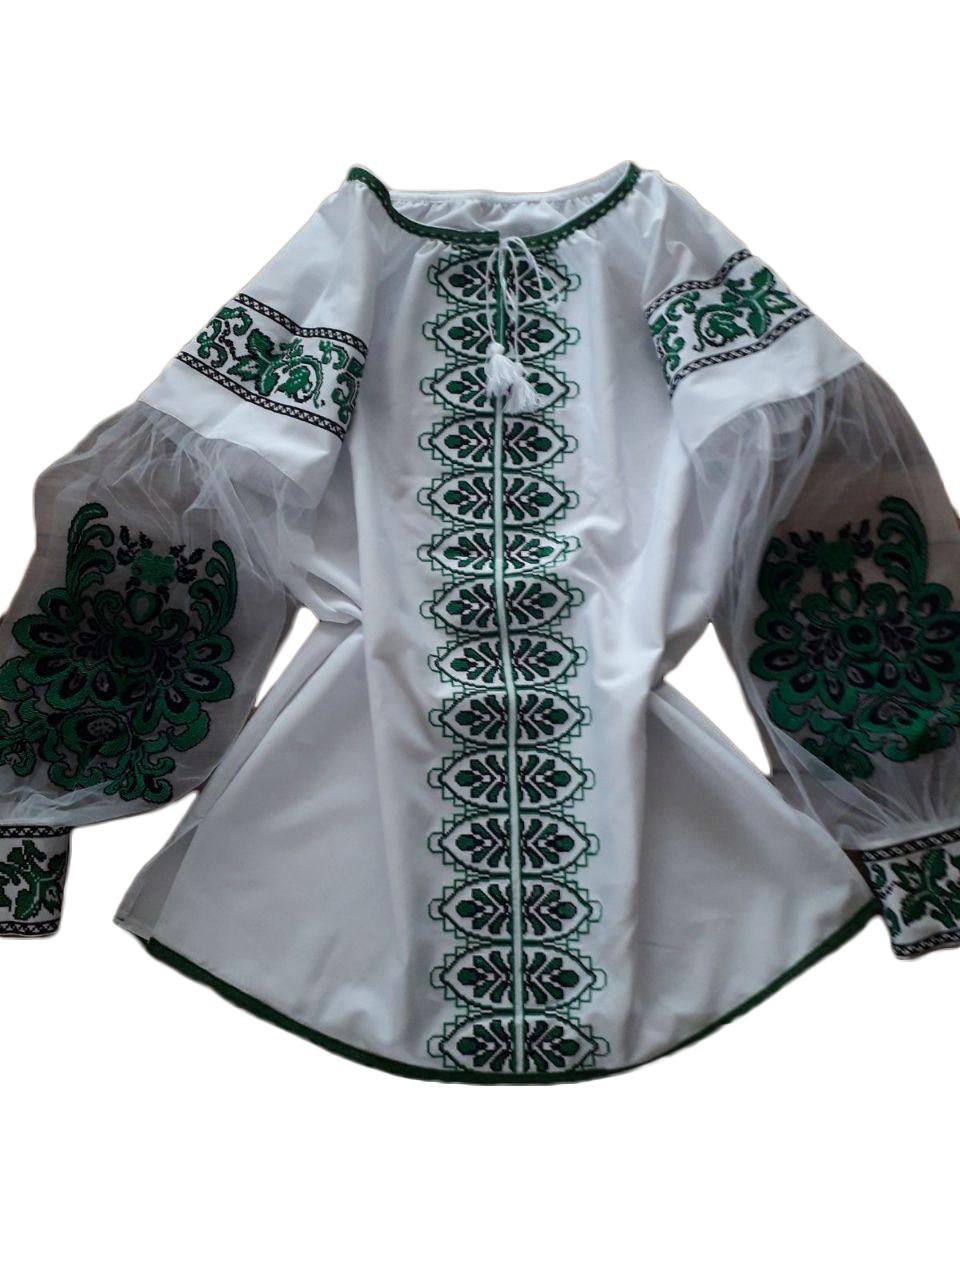 "Жіноча вишита сорочка (блузка) ""Ріана"" (Женская вышитая рубашка (блузка) ""Риана"") BU-0009"